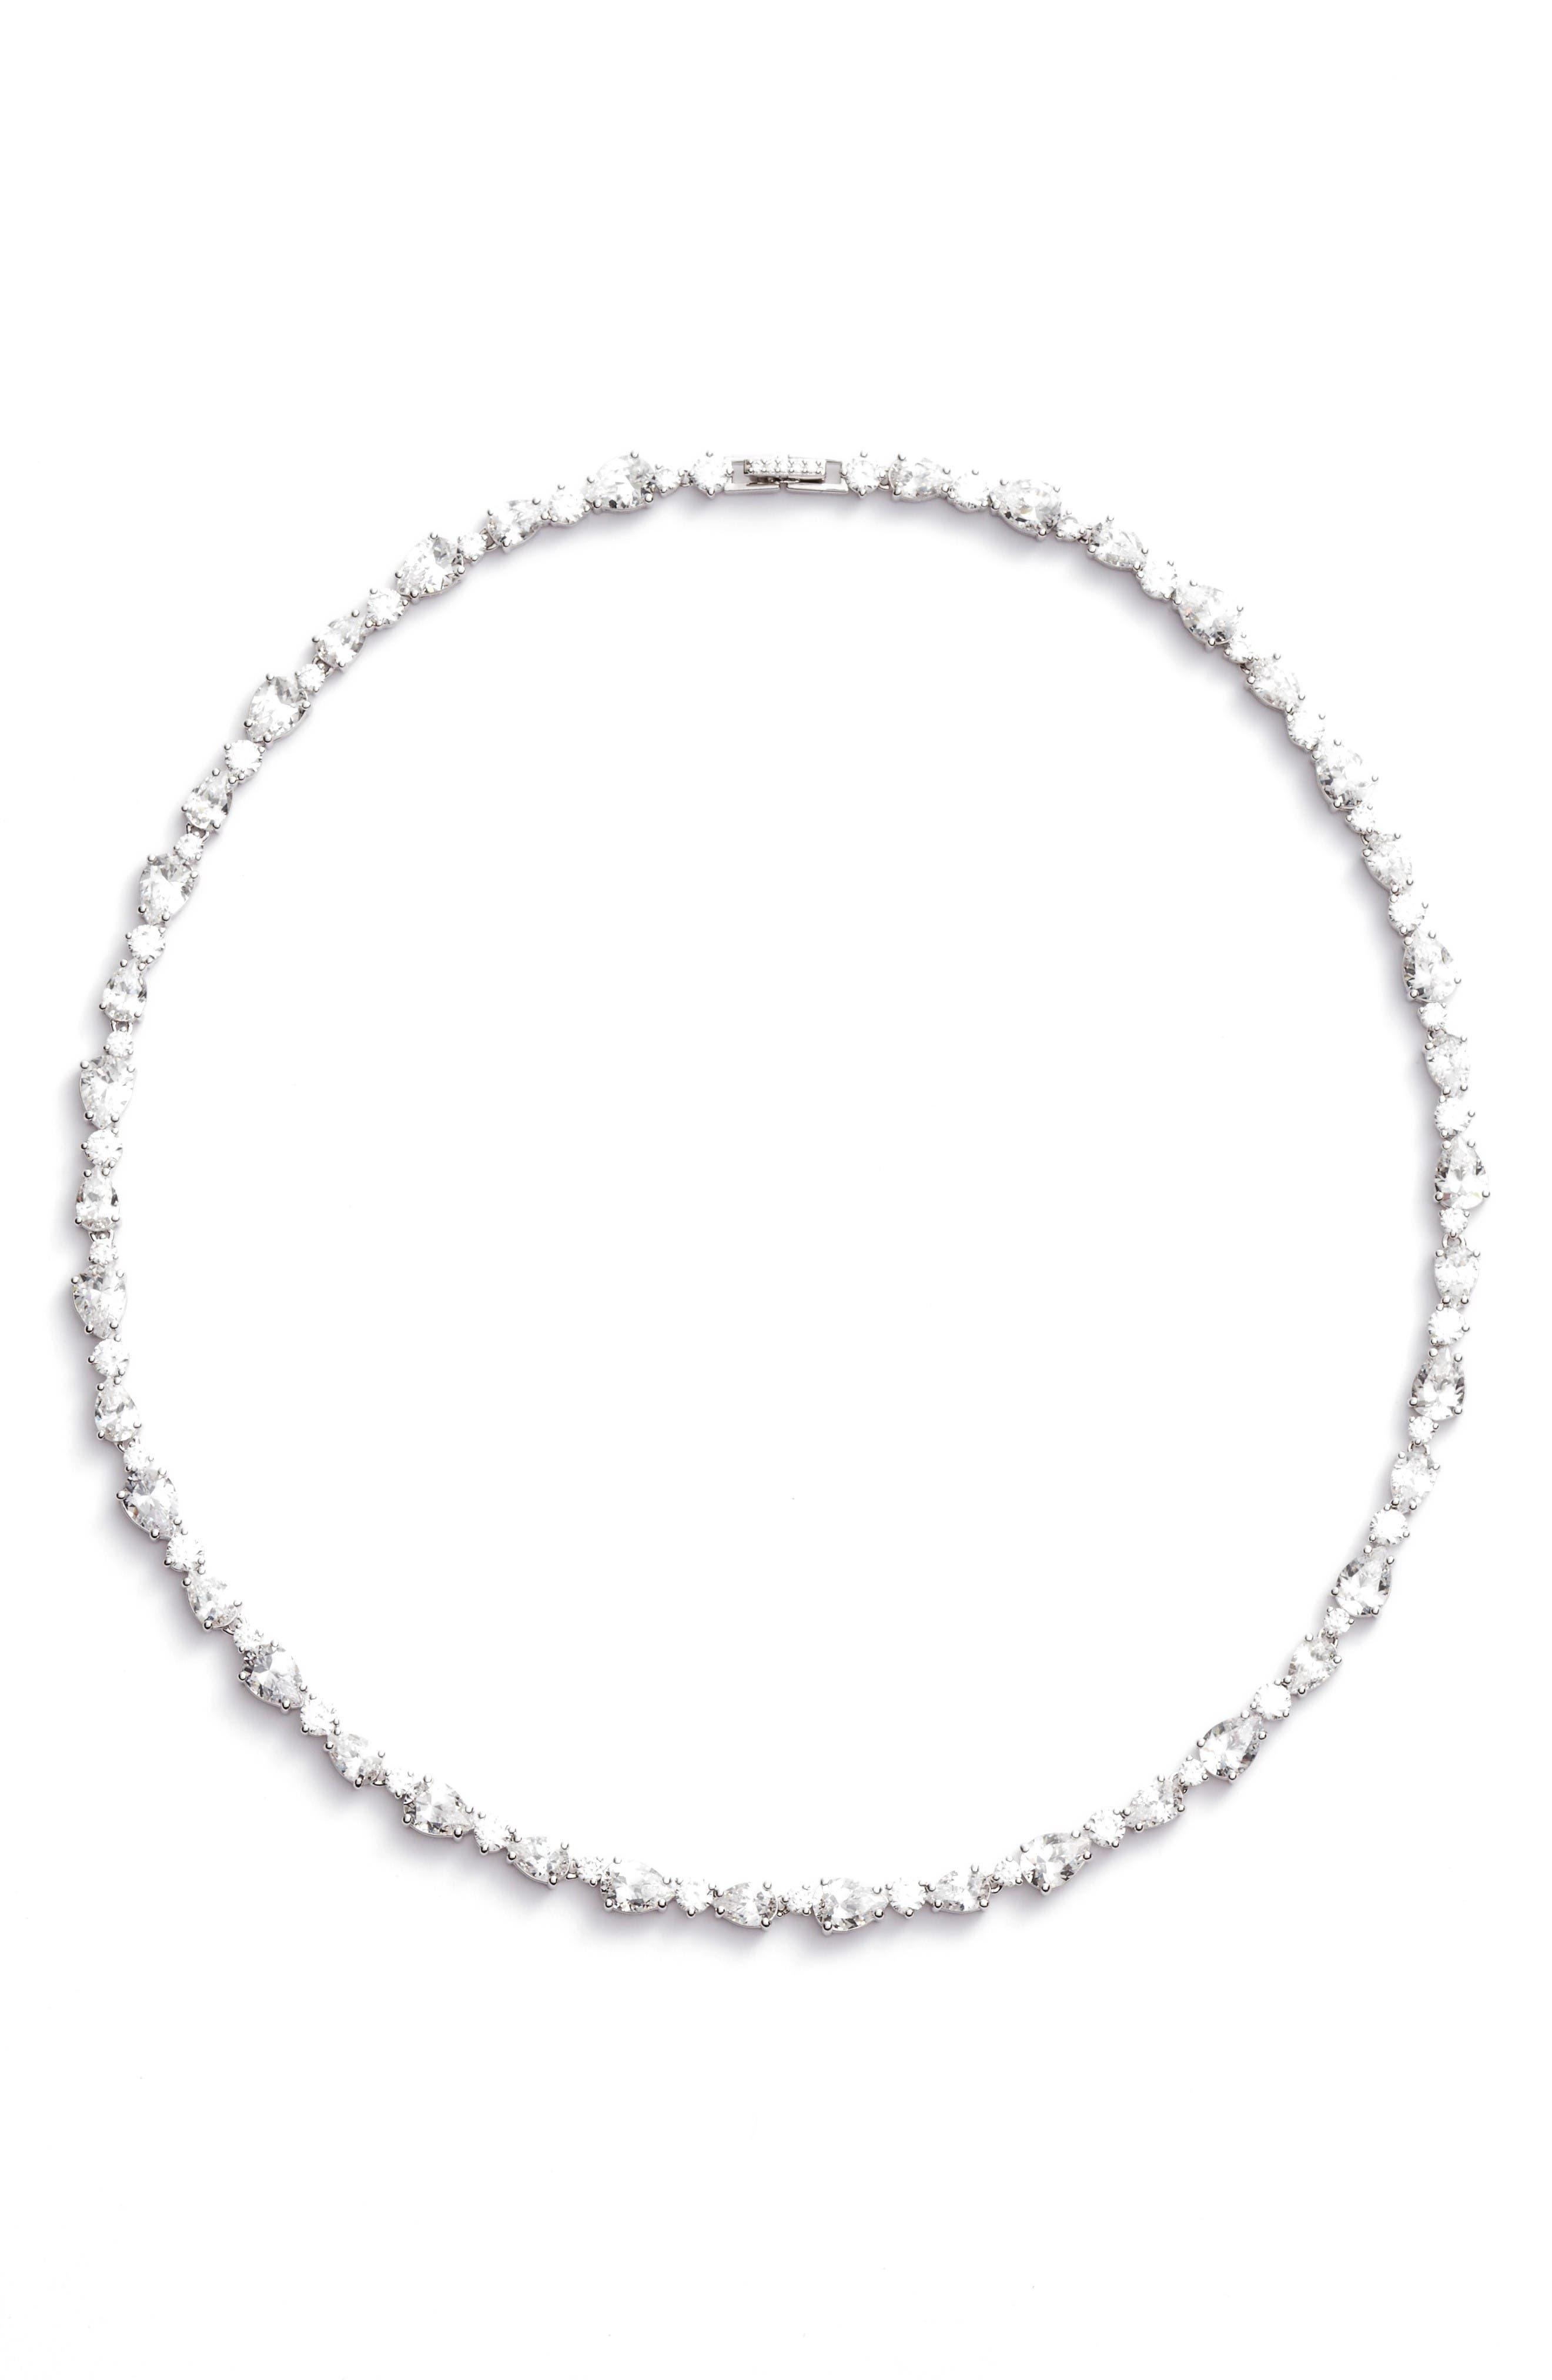 Main Image - Nadri Ava Crystal Collar Necklace